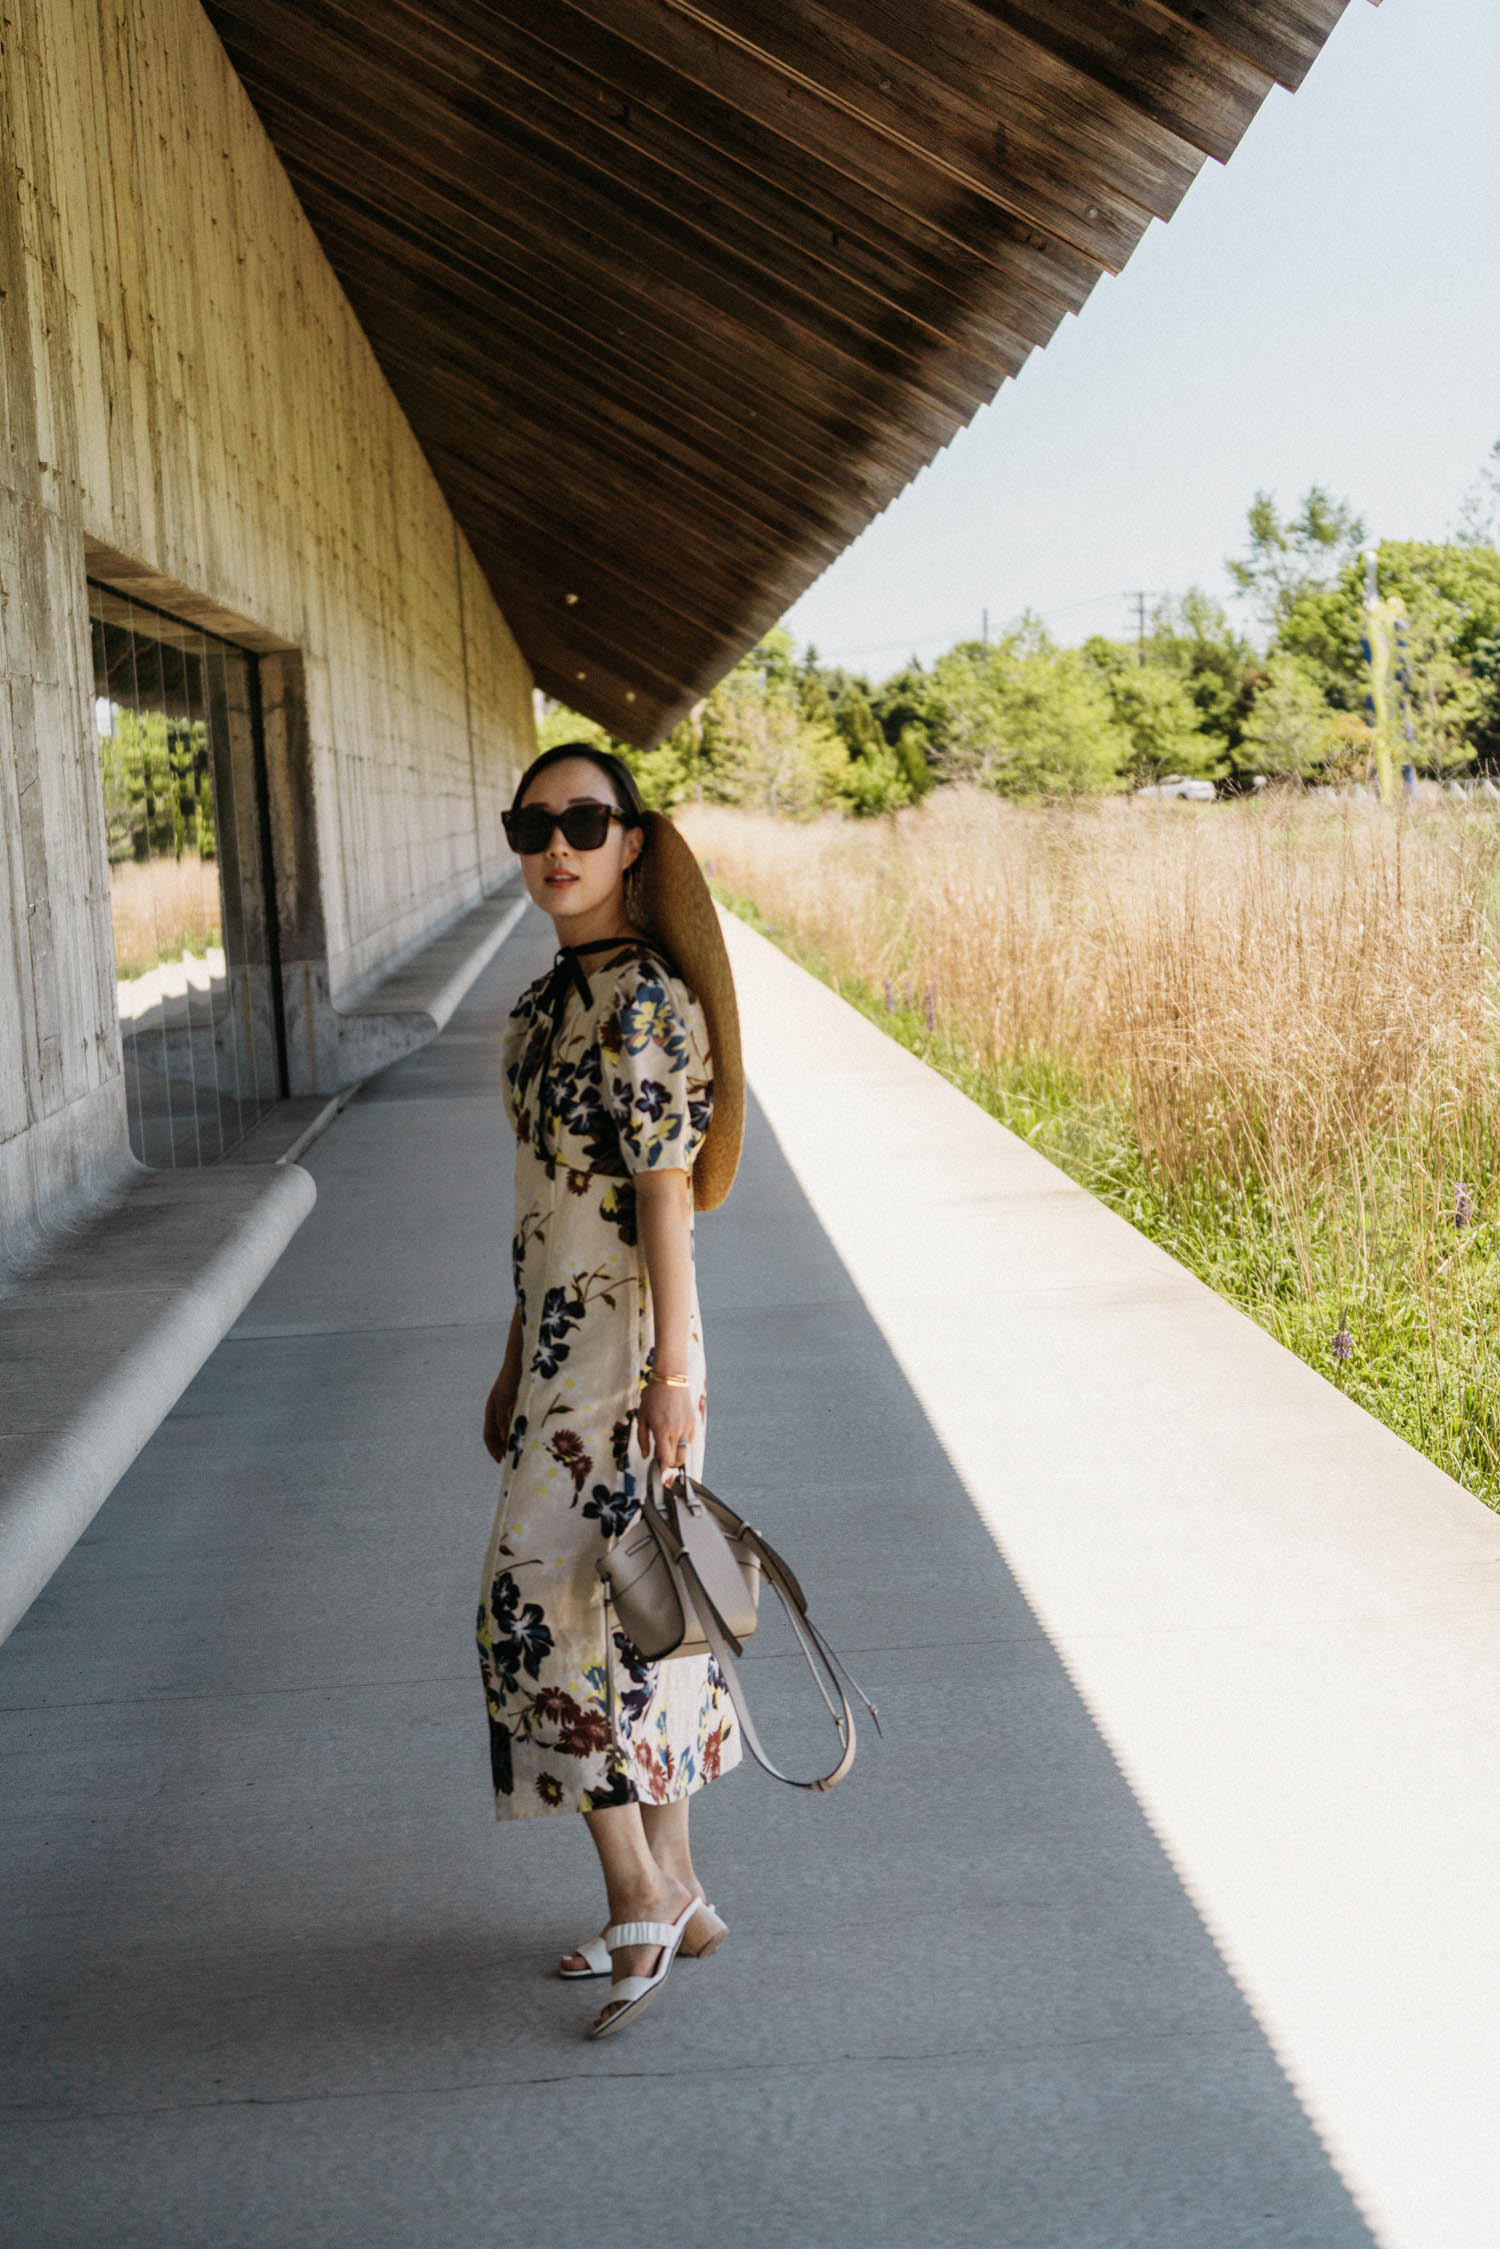 SEA New York Dress ,  Dear Frances Sandals ,  Loewe Bag ,  Jacquemus Hat , Celine Sunglasses